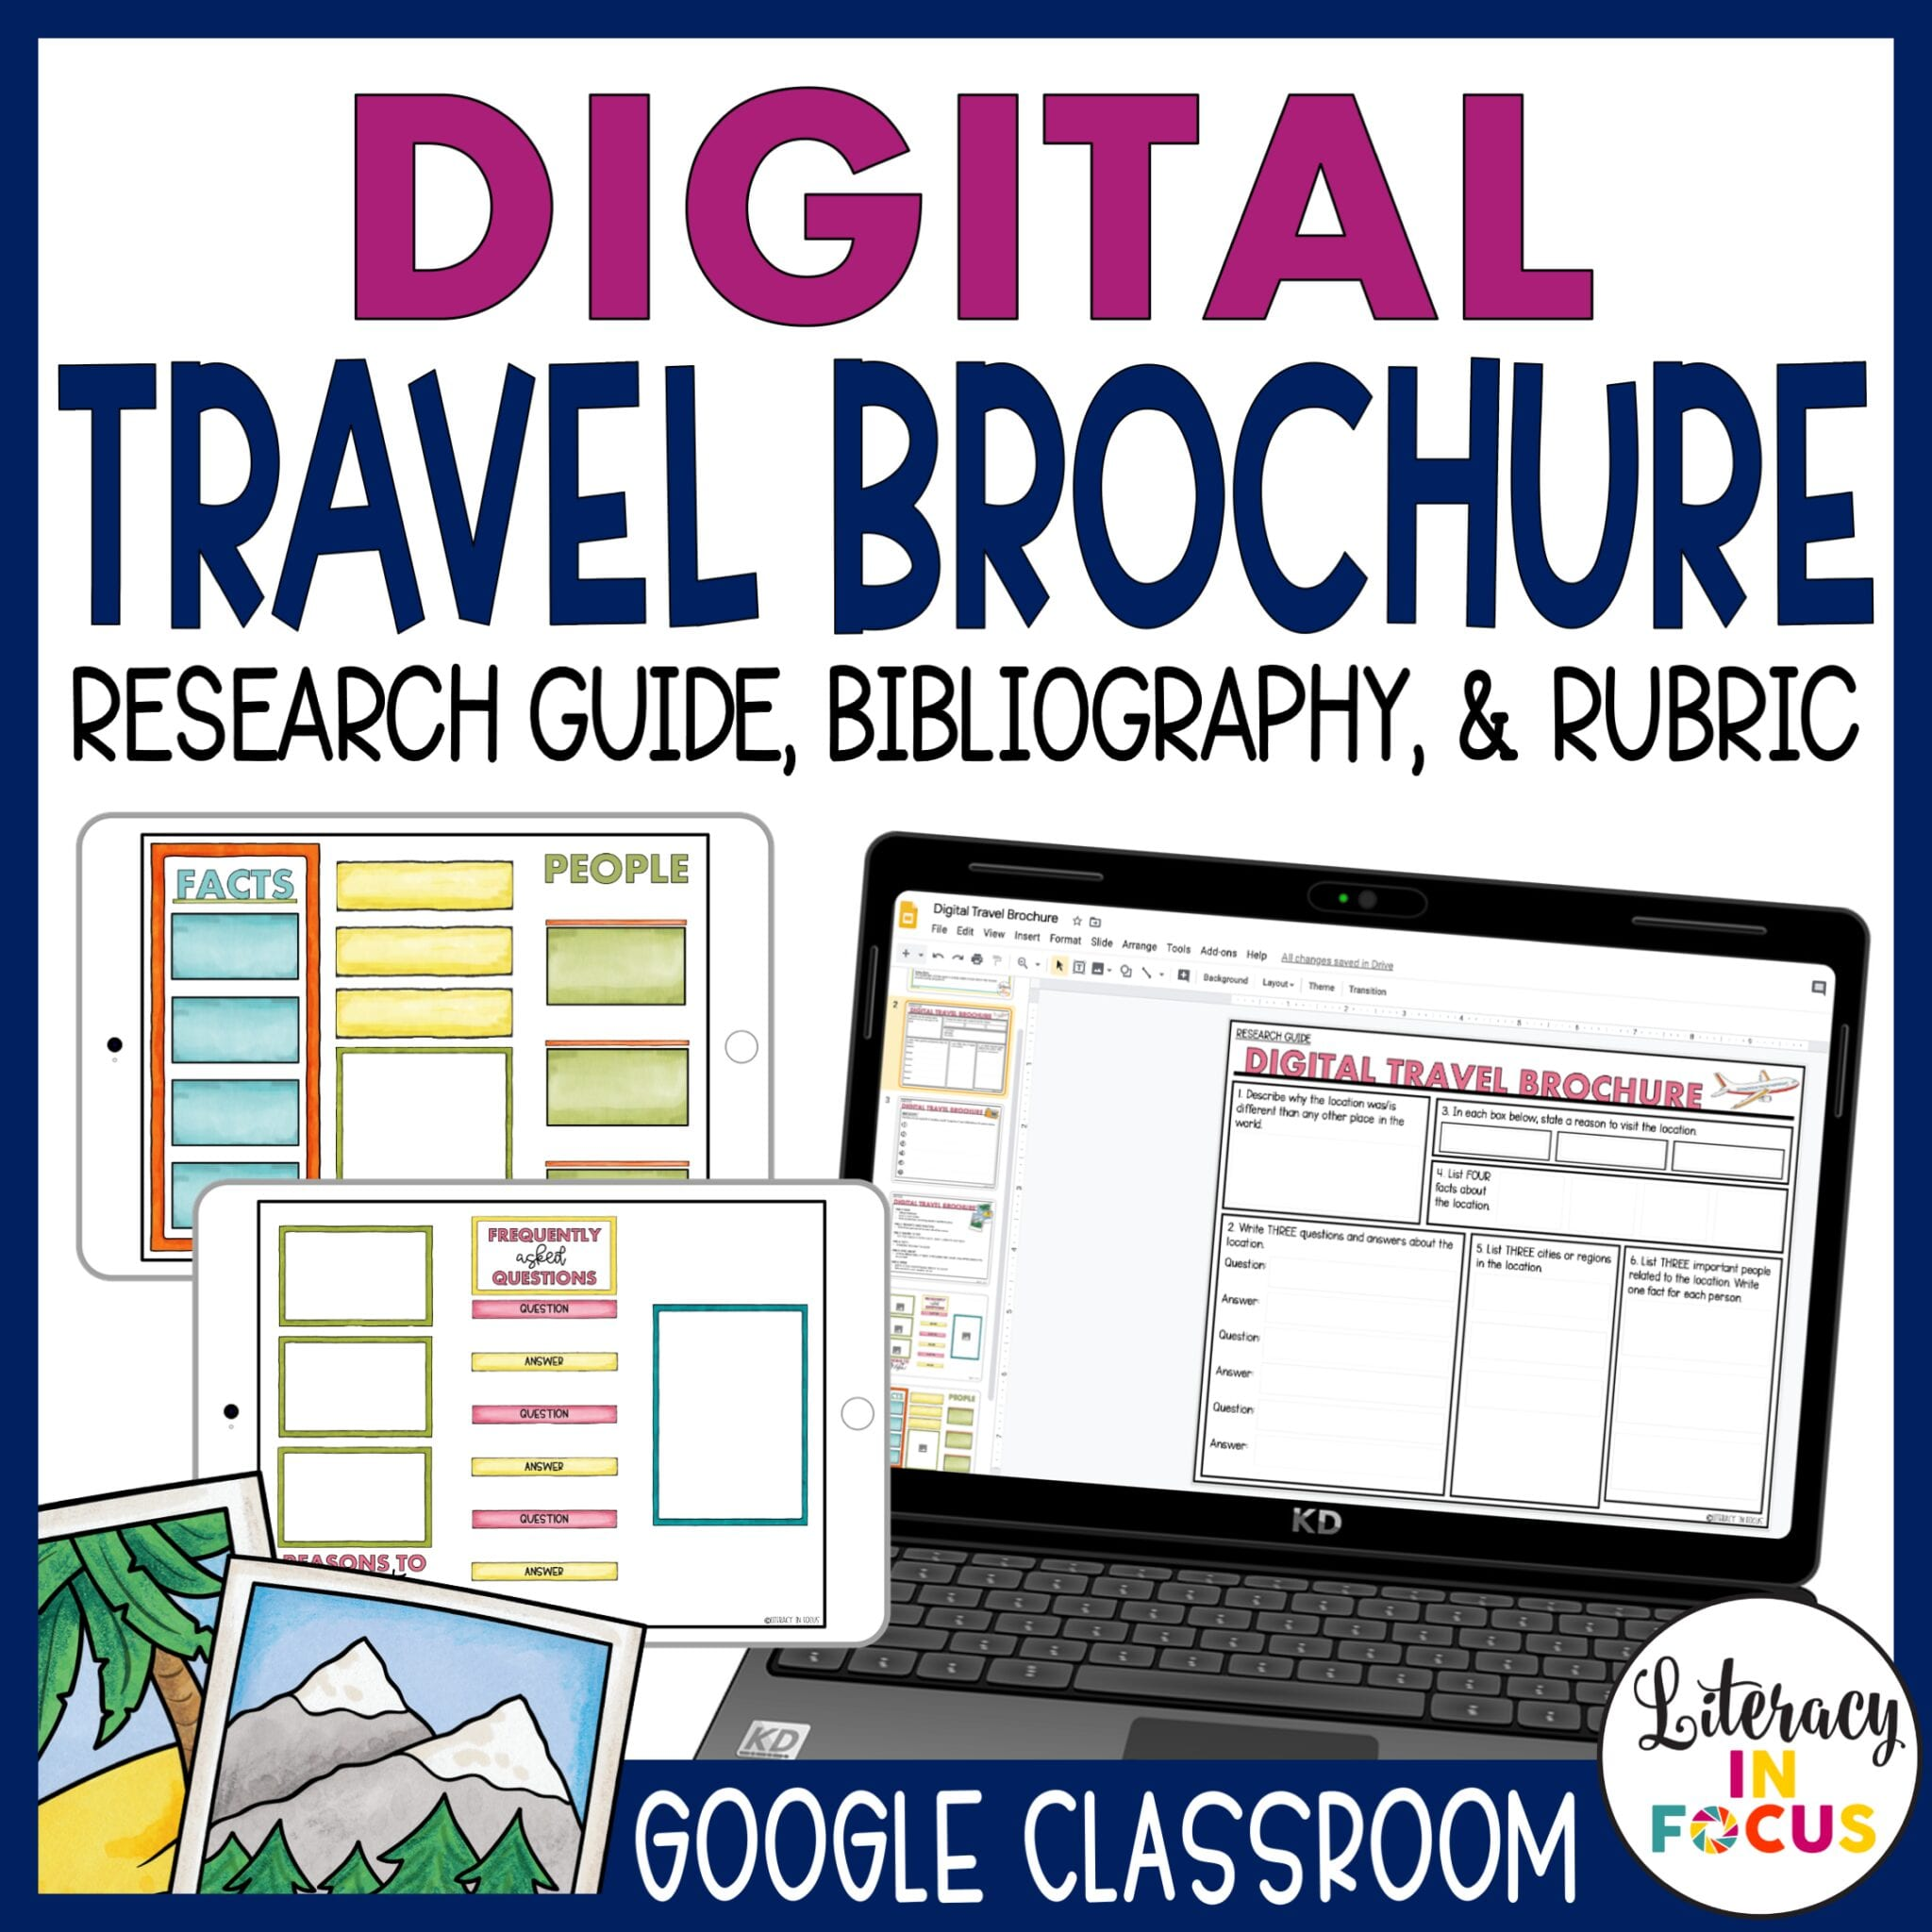 Digital Travel Brochure for Google Classroom